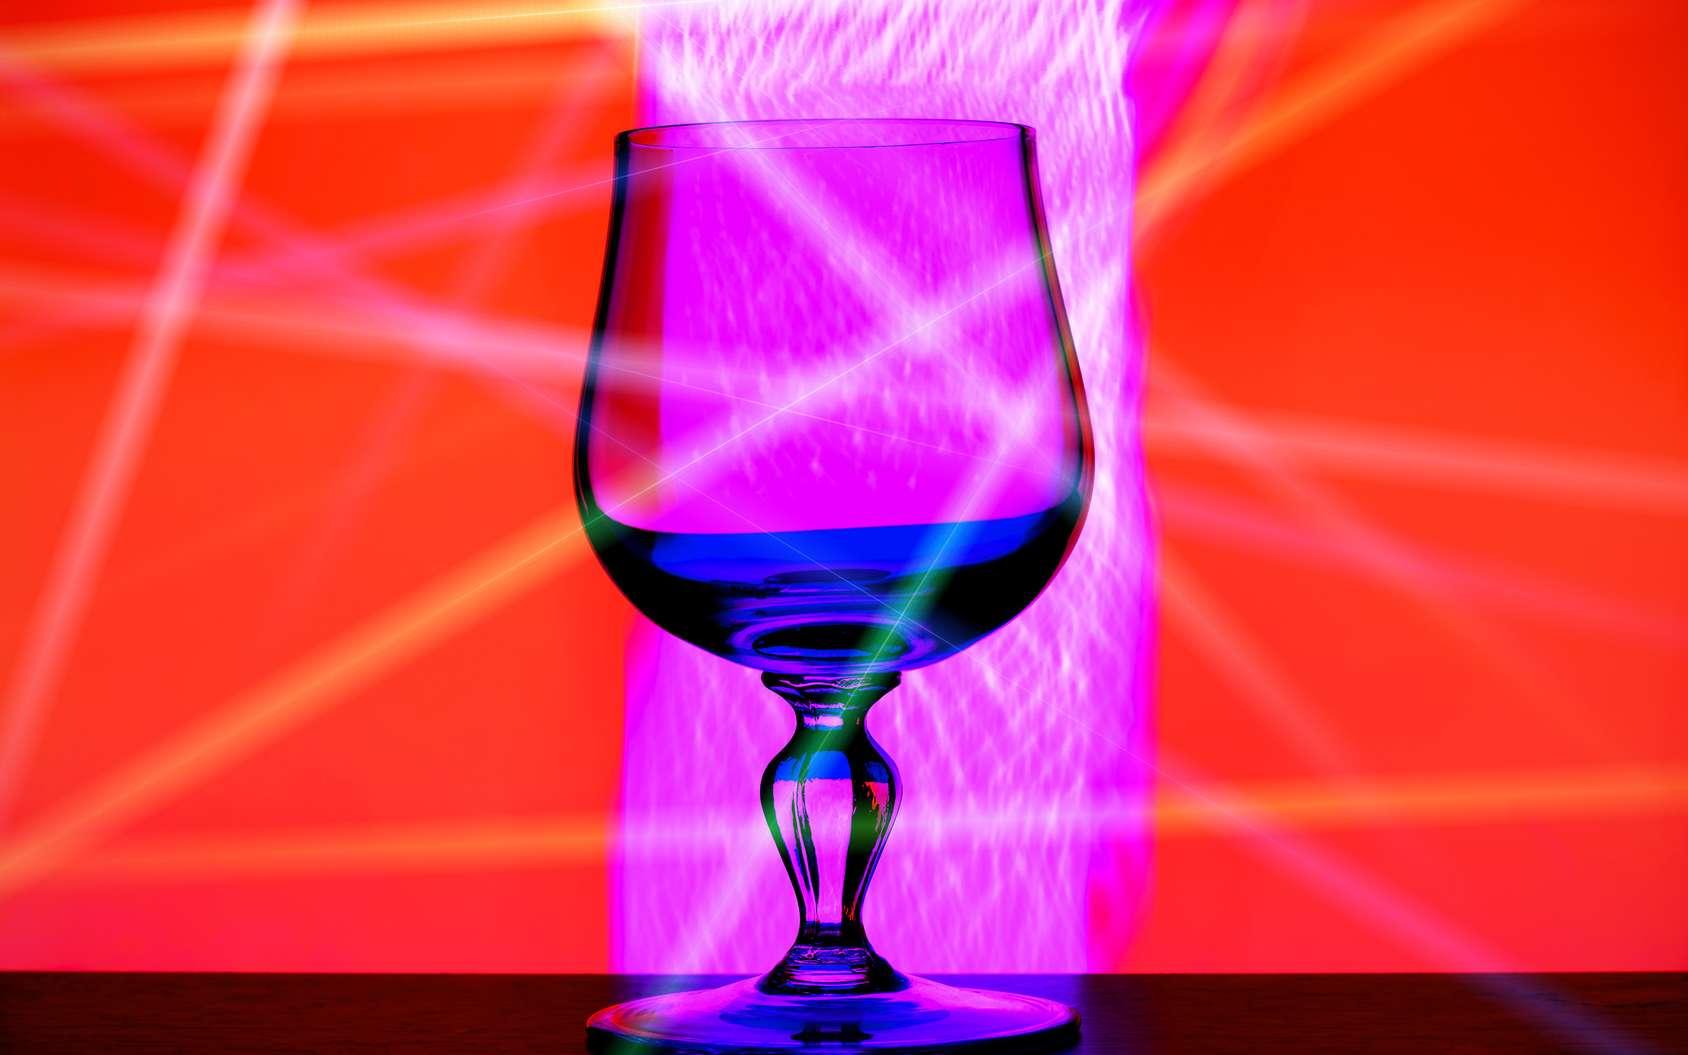 L'addiction à l'alcool concerne environ 10 % des Français. © Iurii Gagarin, Fotolia